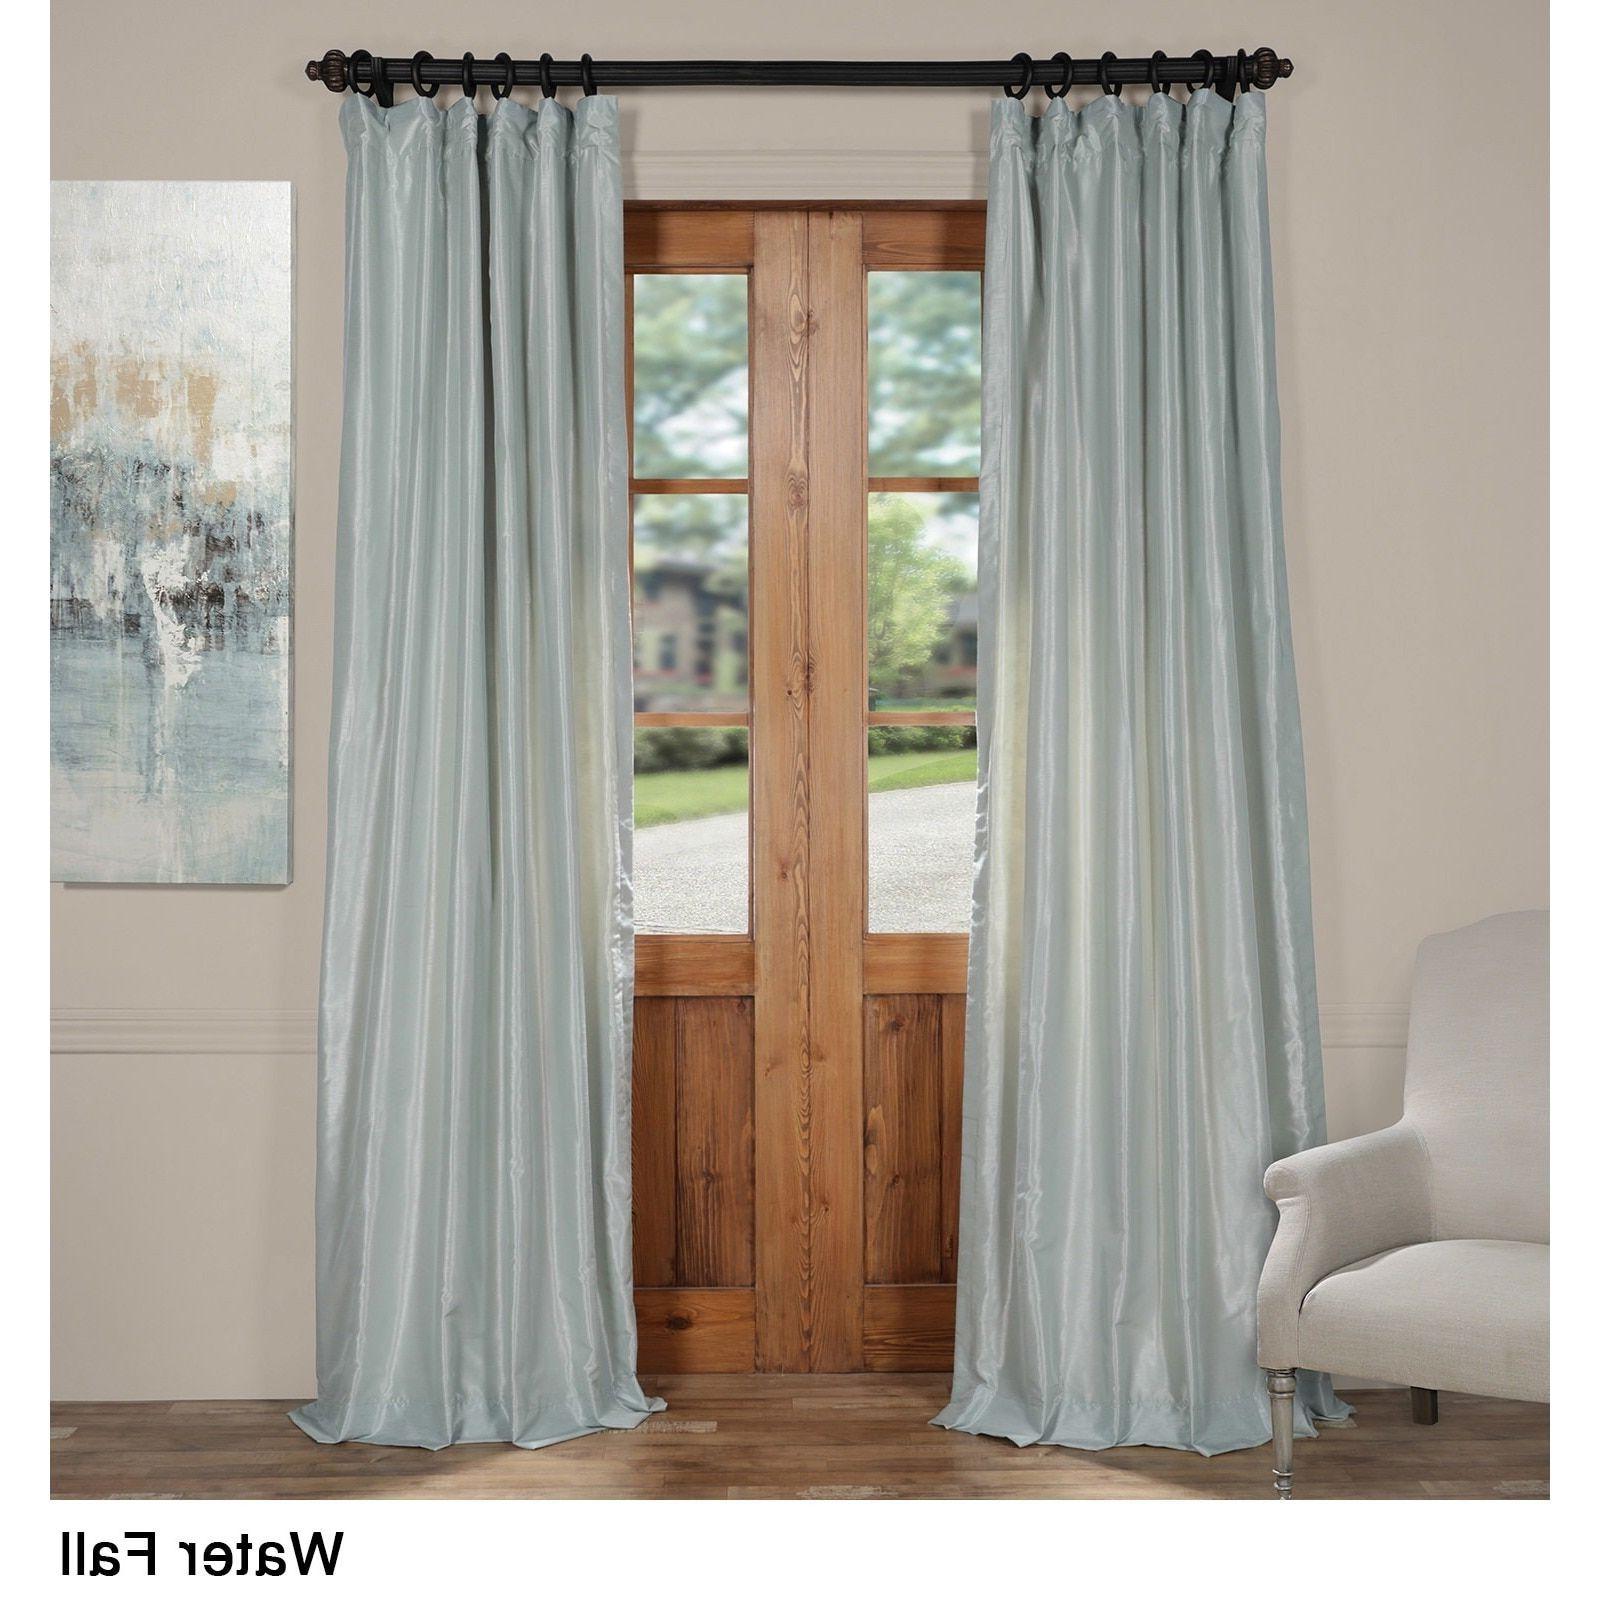 Trendy Exclusive Fabrics Vintage Textured Faux Dupioni Silk Curtain For Vintage Textured Faux Dupioni Silk Curtain Panels (View 17 of 20)